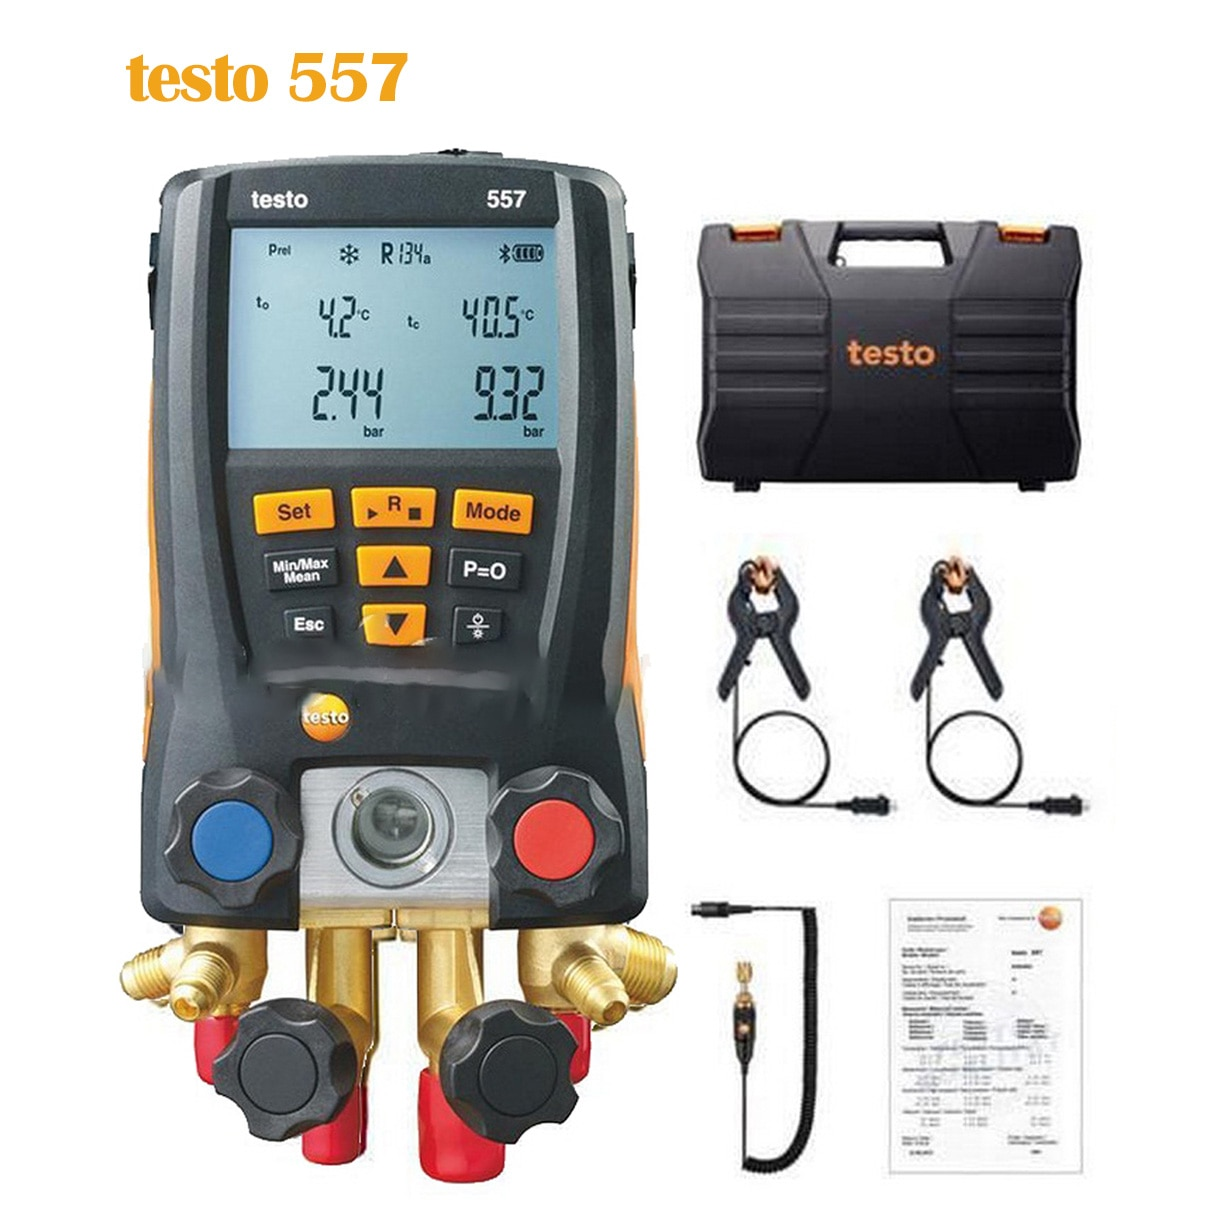 Testo 557 مقياس الضغط الرقمي للتبريد تكييف الهواء التبريد المنوع المشبك التحقيق عدة اختبار درجة الحرارة أداة